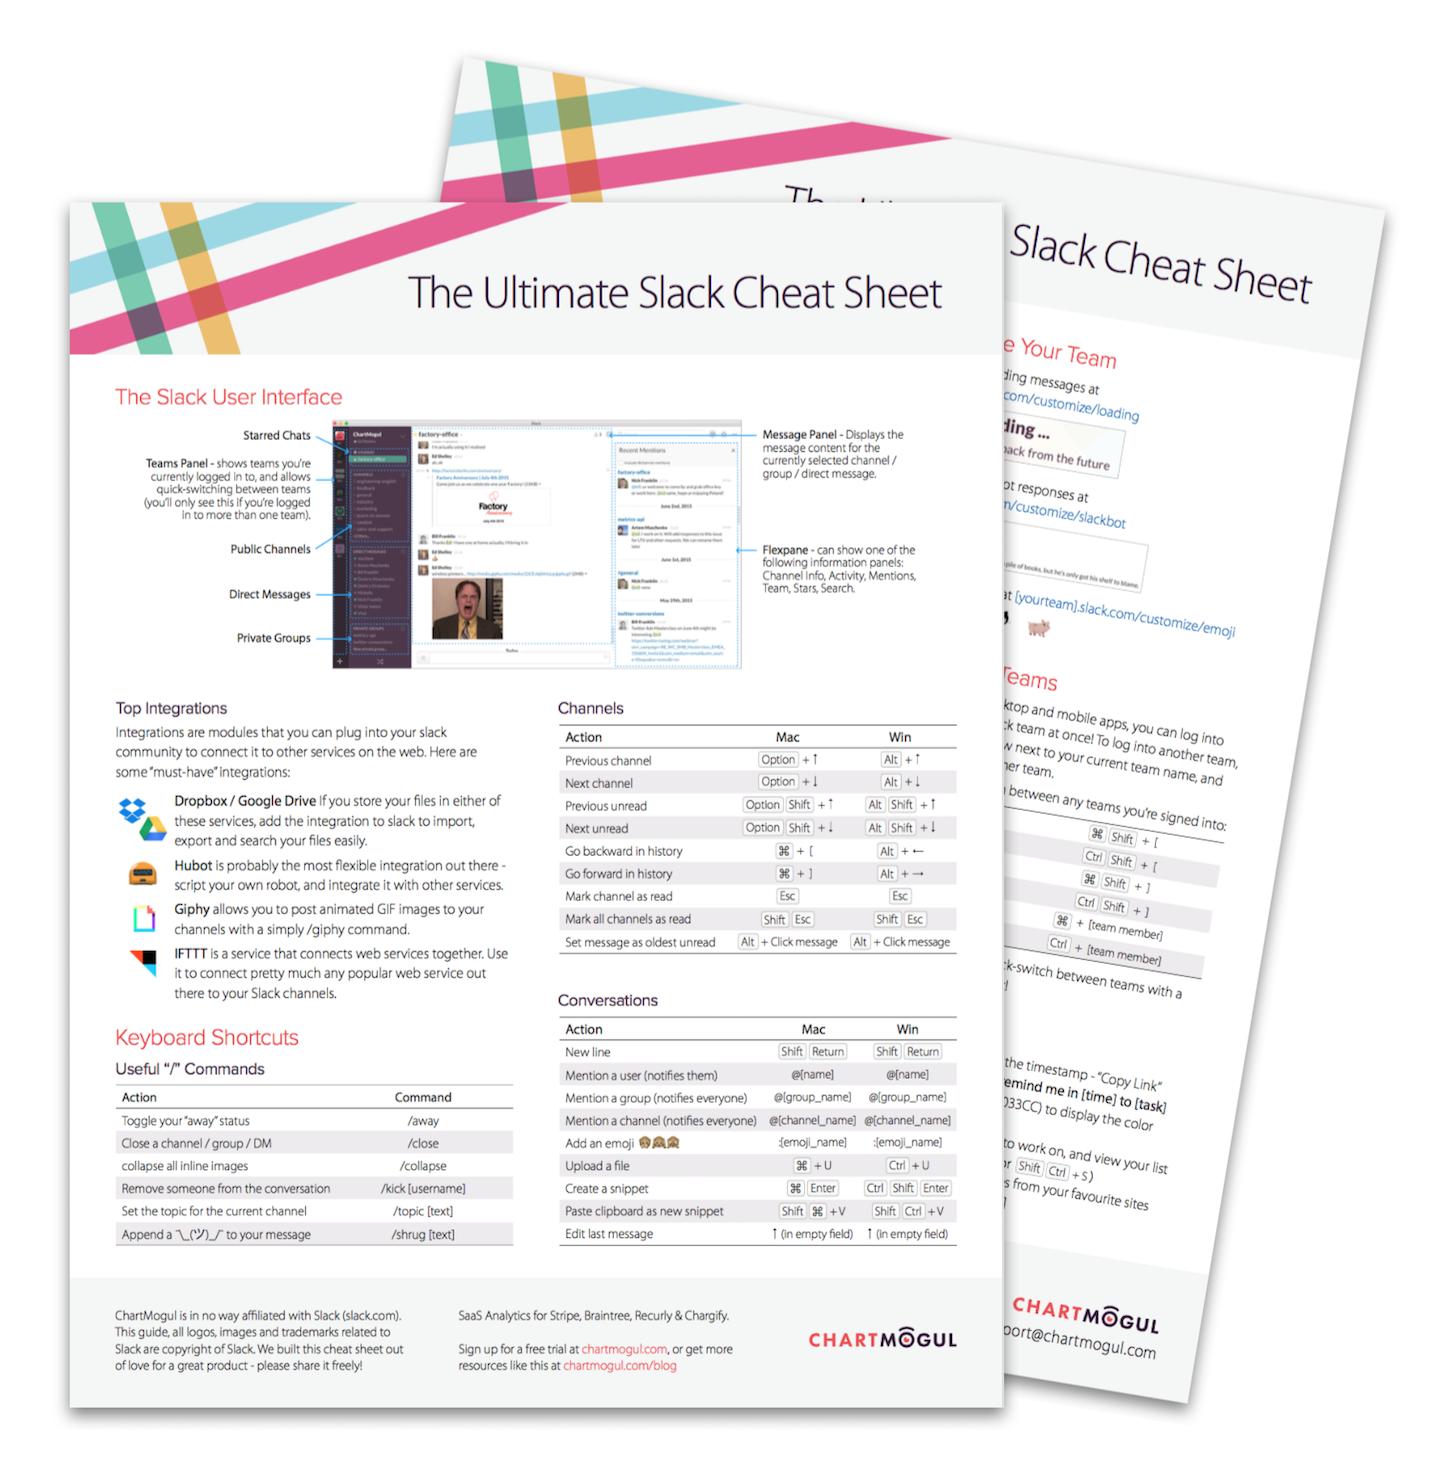 Slack Cheat Sheet